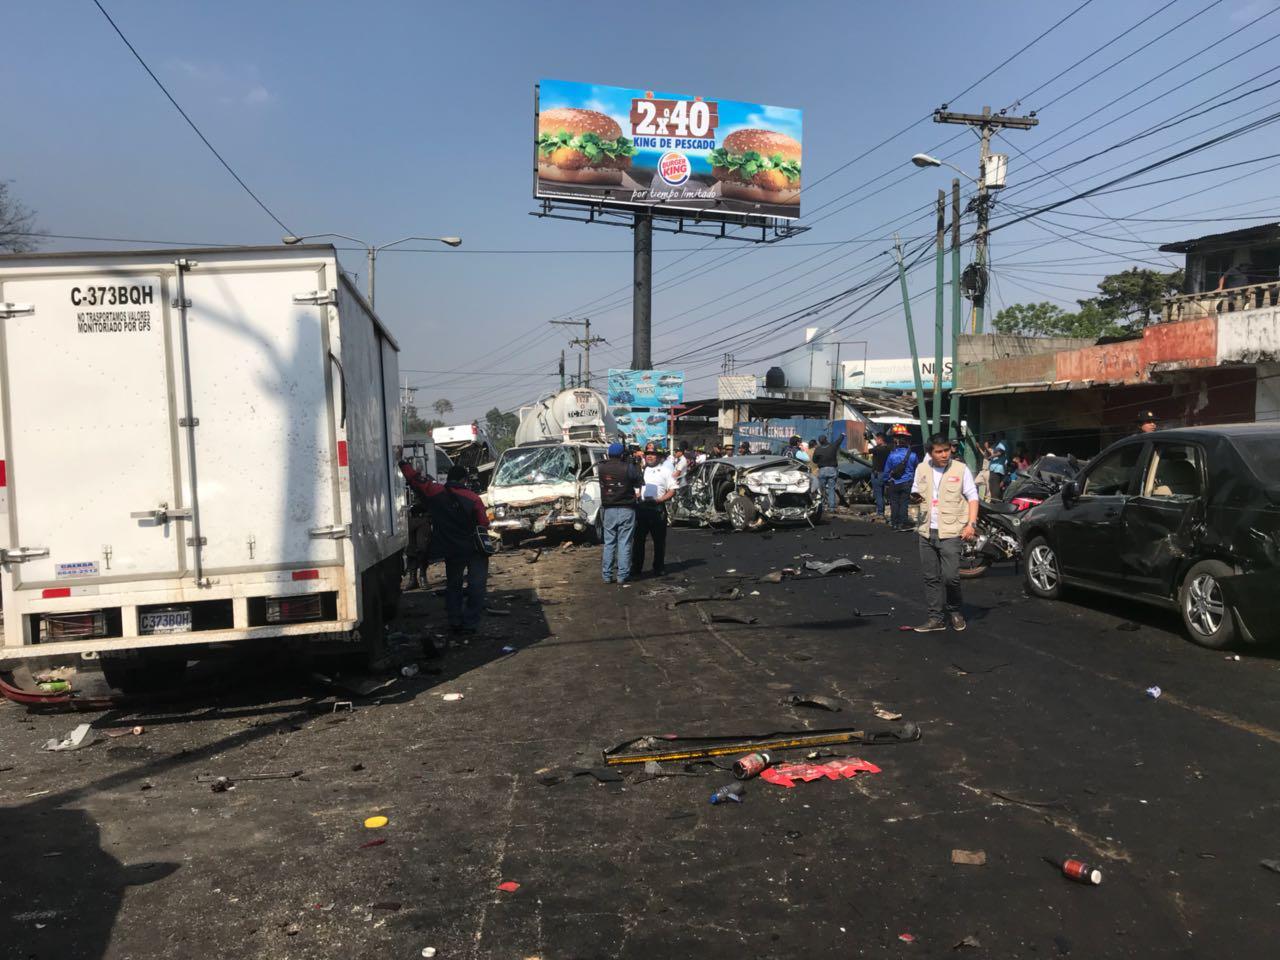 Accidente de tránsito en ruta Interamericana EU Emisoras Unidas, Guatemala